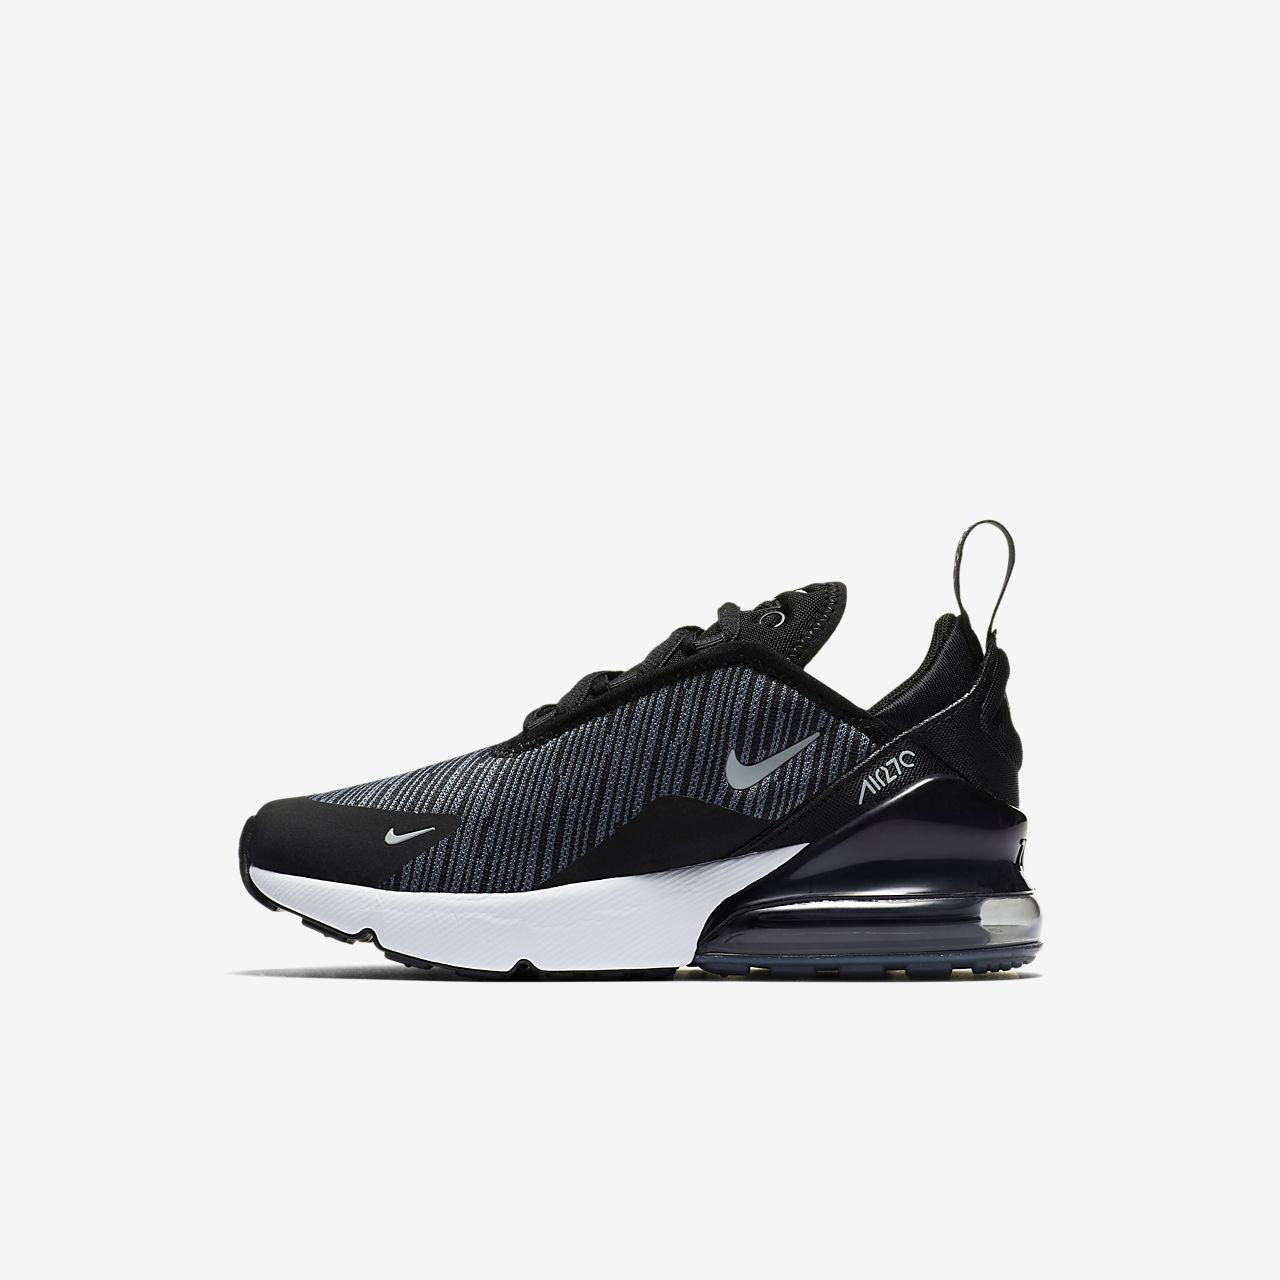 sneakers for cheap 95ab9 83d54 ... netherlands nike air max 270 sko for små barn f0d1a b7ebf